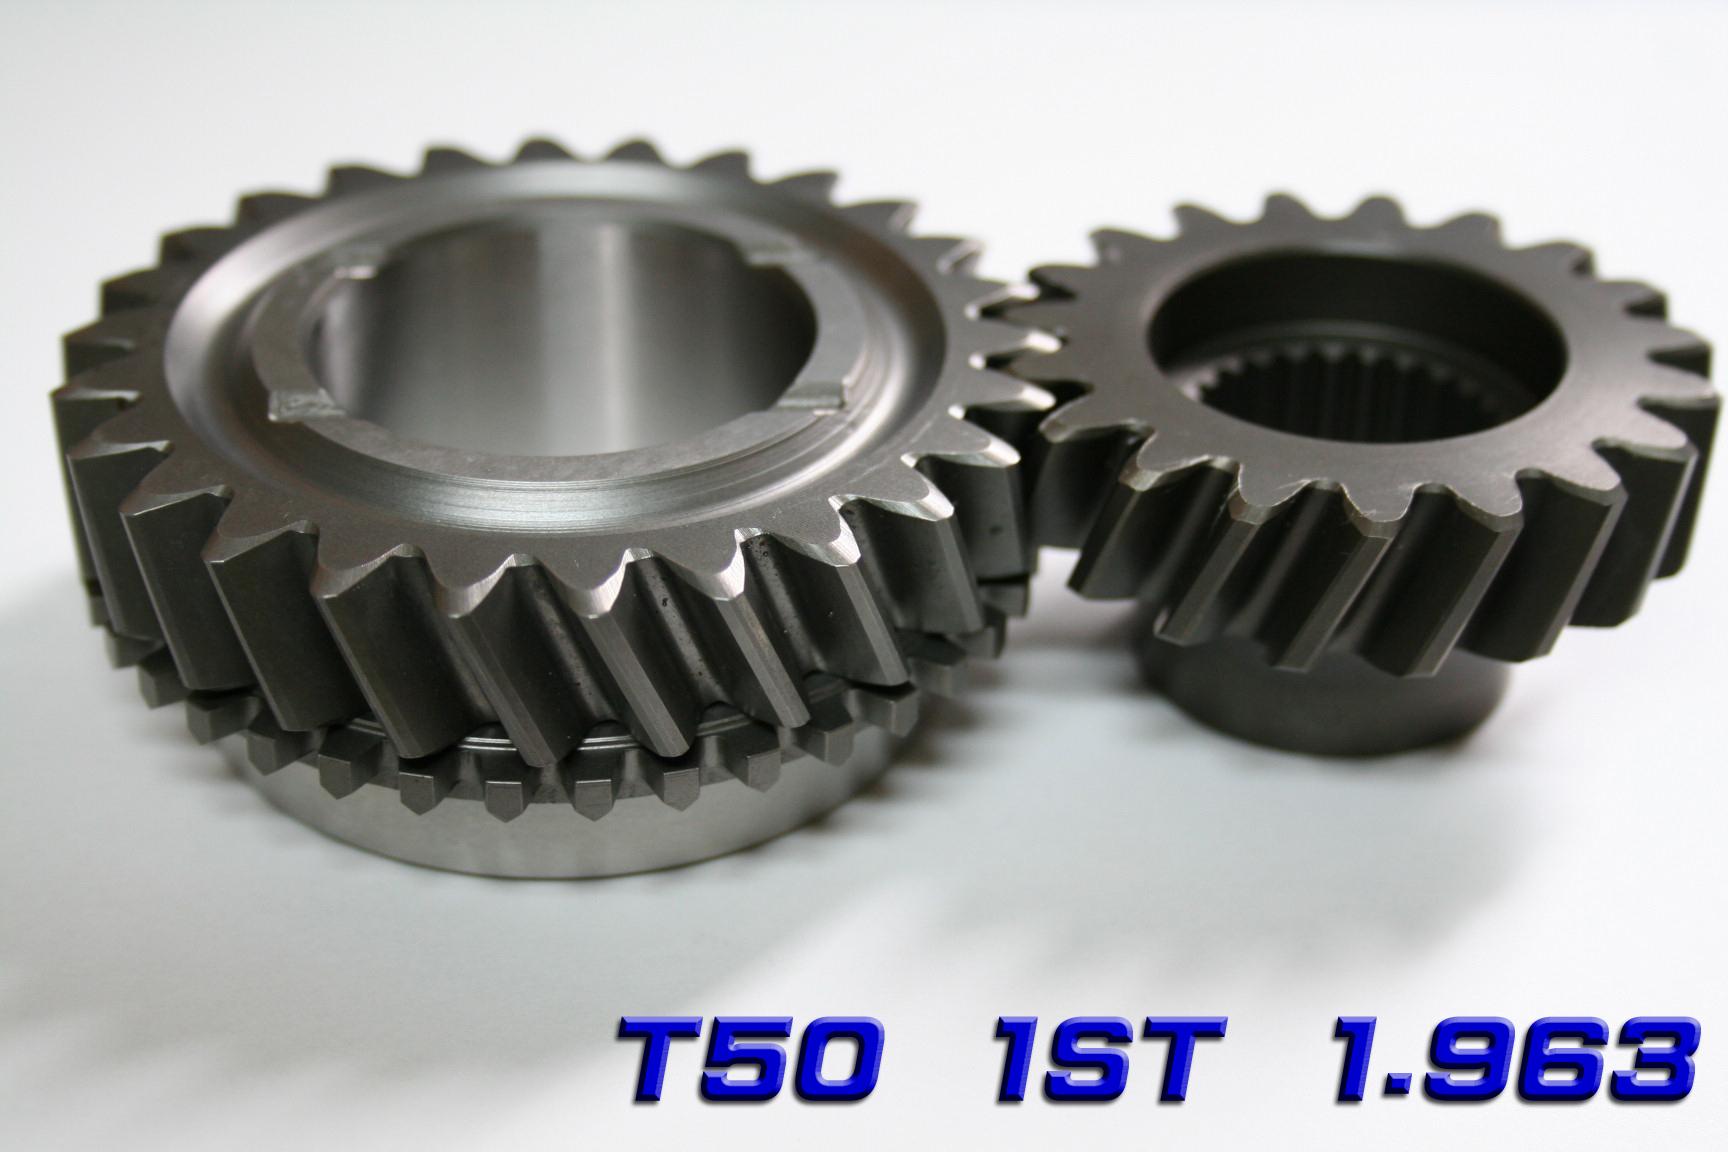 T50 1st 1.963